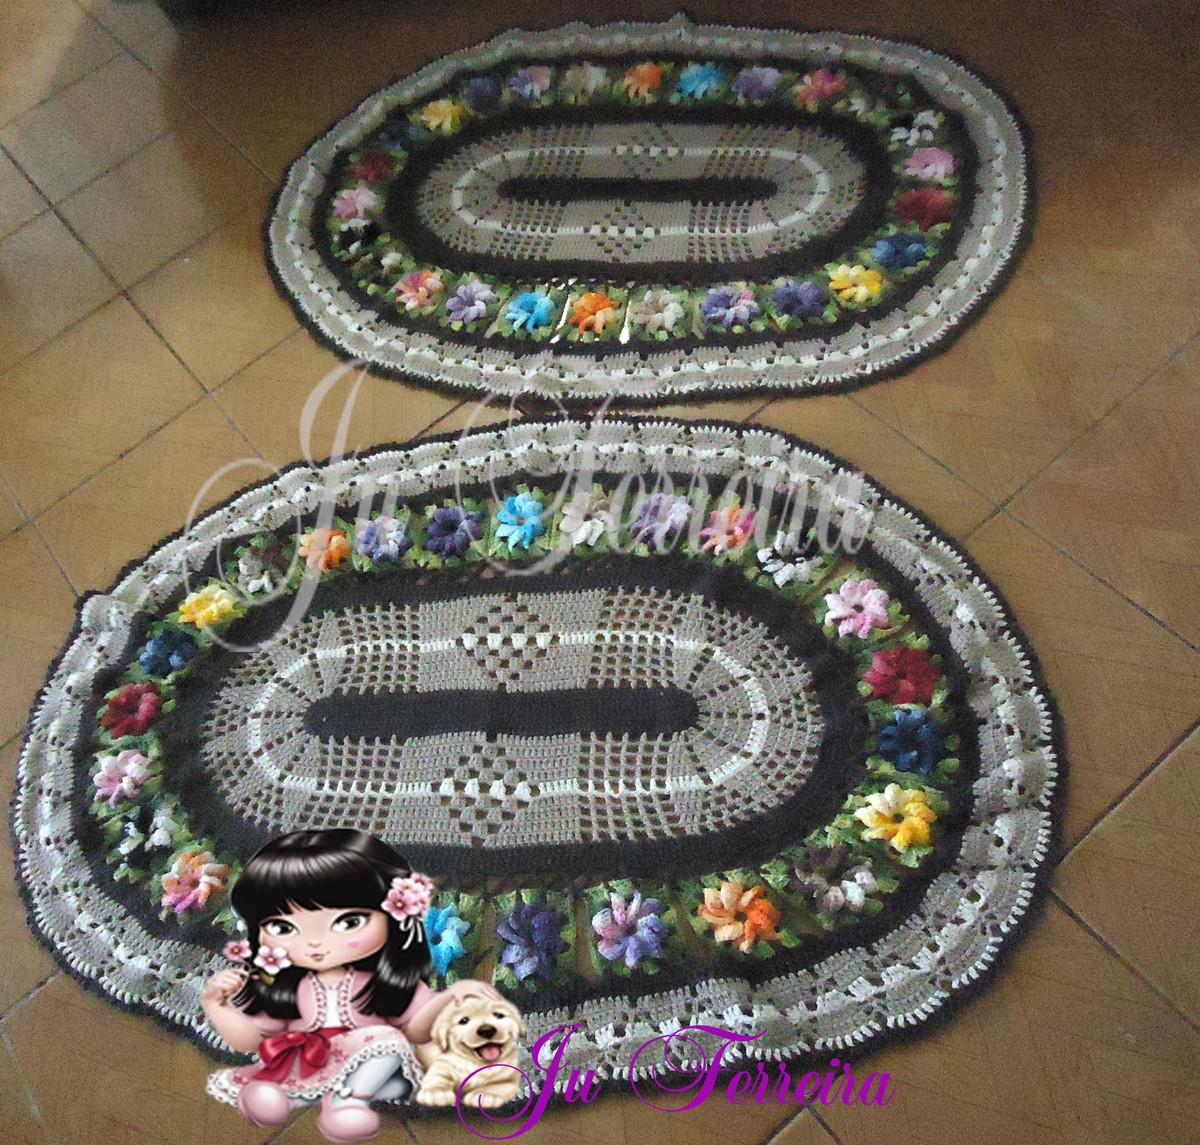 Tapete floral no elo7 atelie ju ferreira 546c62 for Tapete floral